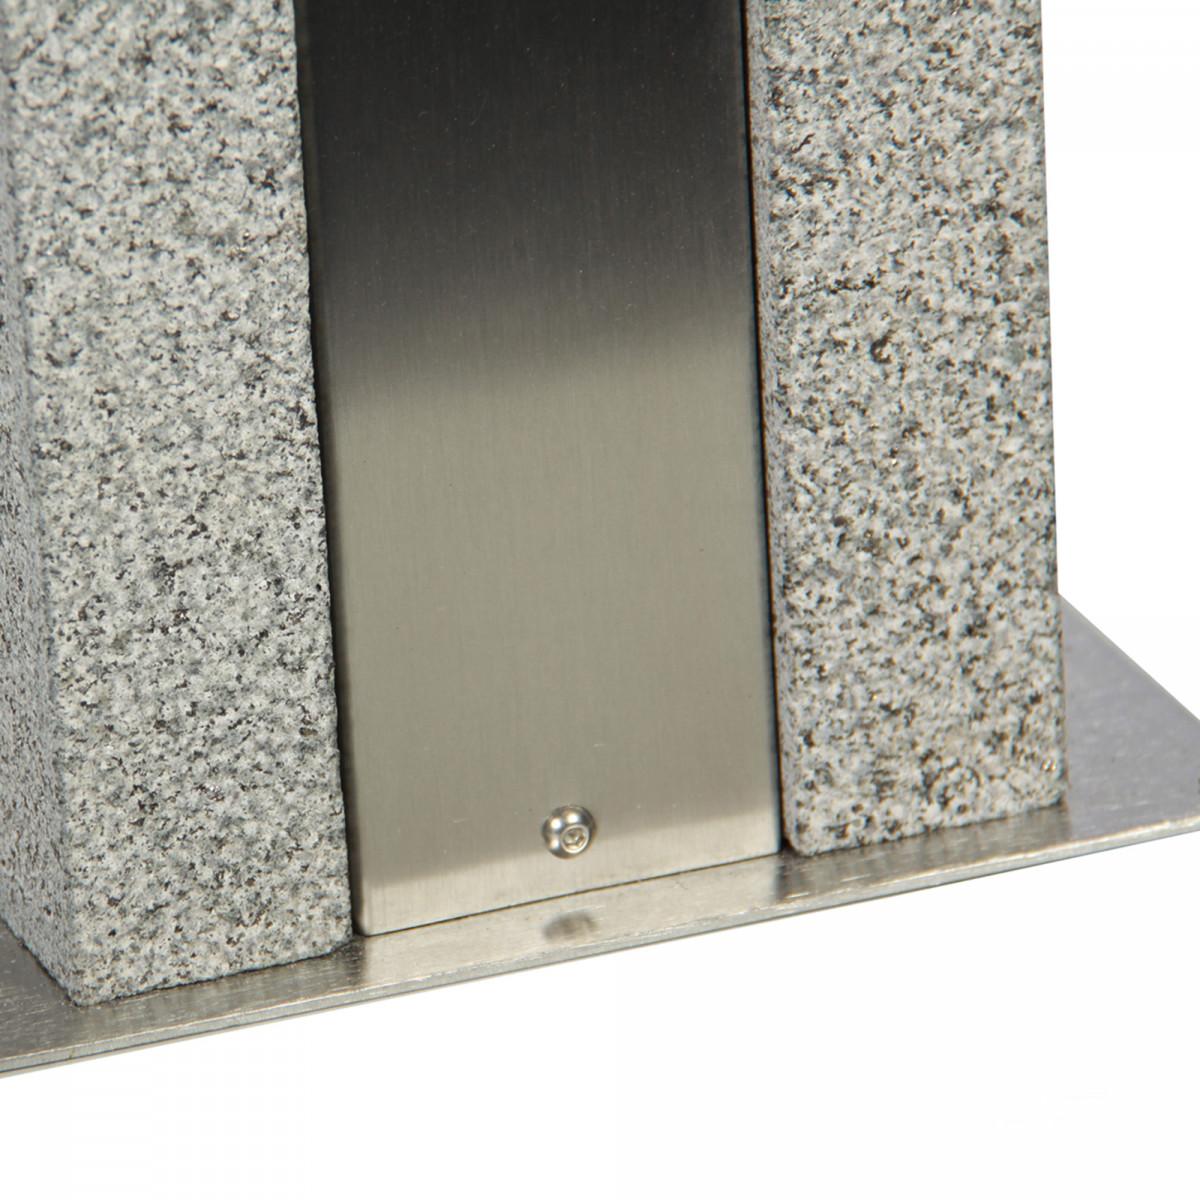 Groeve graniet Tuinlamp (7383) - KS Verlichting - Design & Exclusief